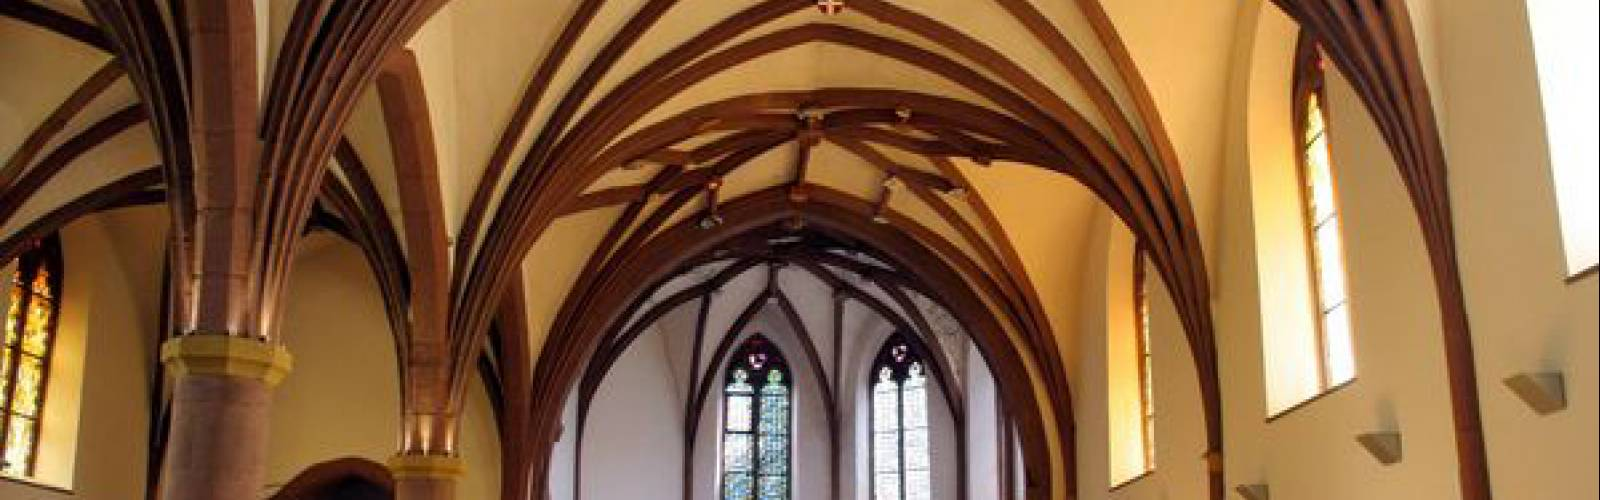 dekanatskirche wiltz